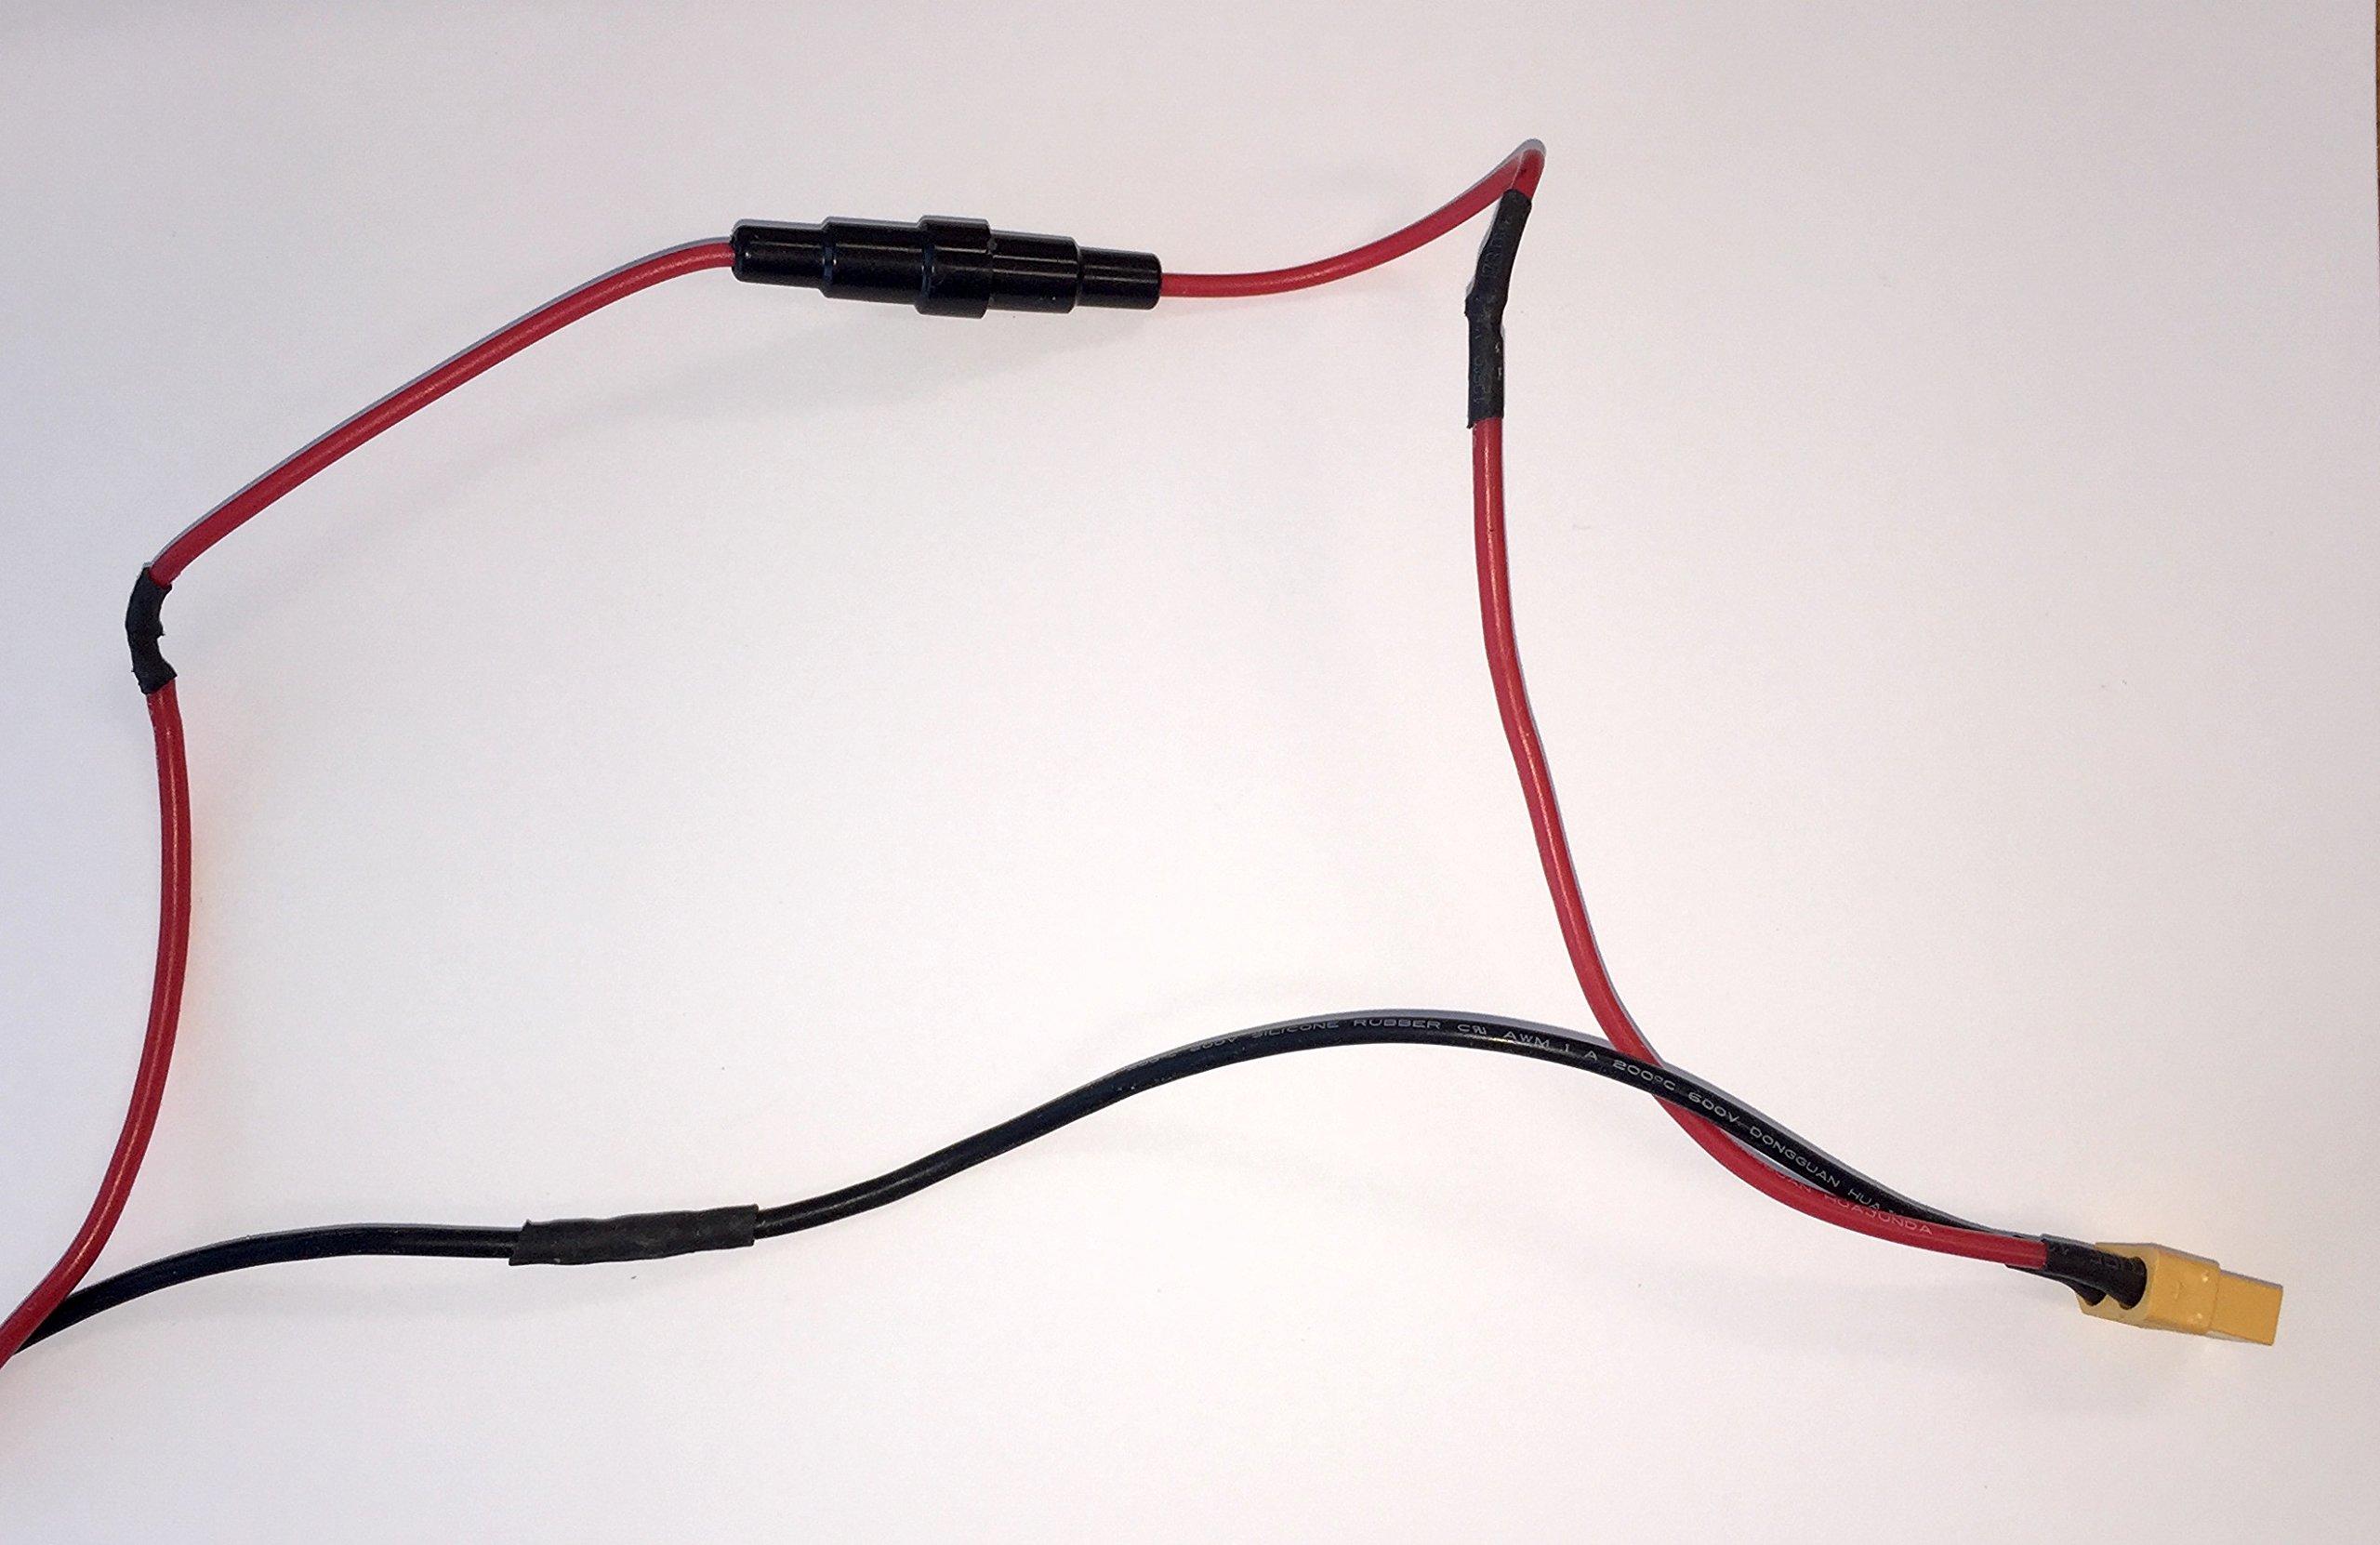 KO Fuse 5 Amp Inline Glass Fuse Holder Set - 18 Gauge Copper Wires + Quick Blow Glass Fuses (1Amp 2Amp 3Amp 5Amp 10Amp) (5 Amp) by KO Fuse (Image #4)